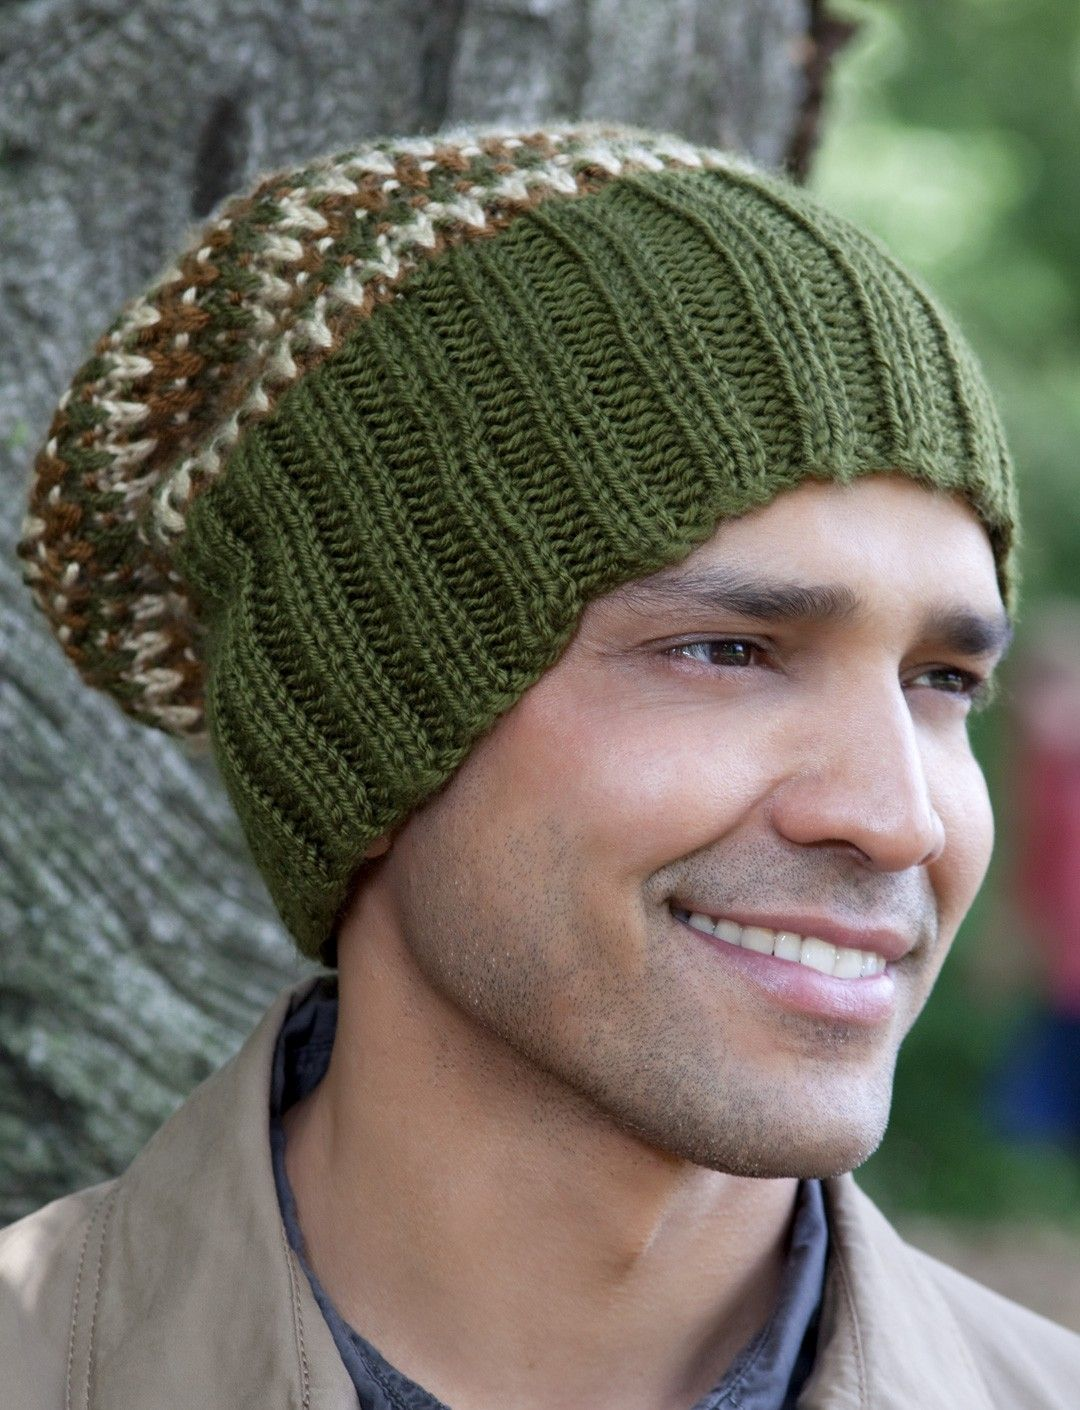 db996325fff5a ... men s beanie! Yarnspirations.com - Caron His Tri-Color Hat - Patterns